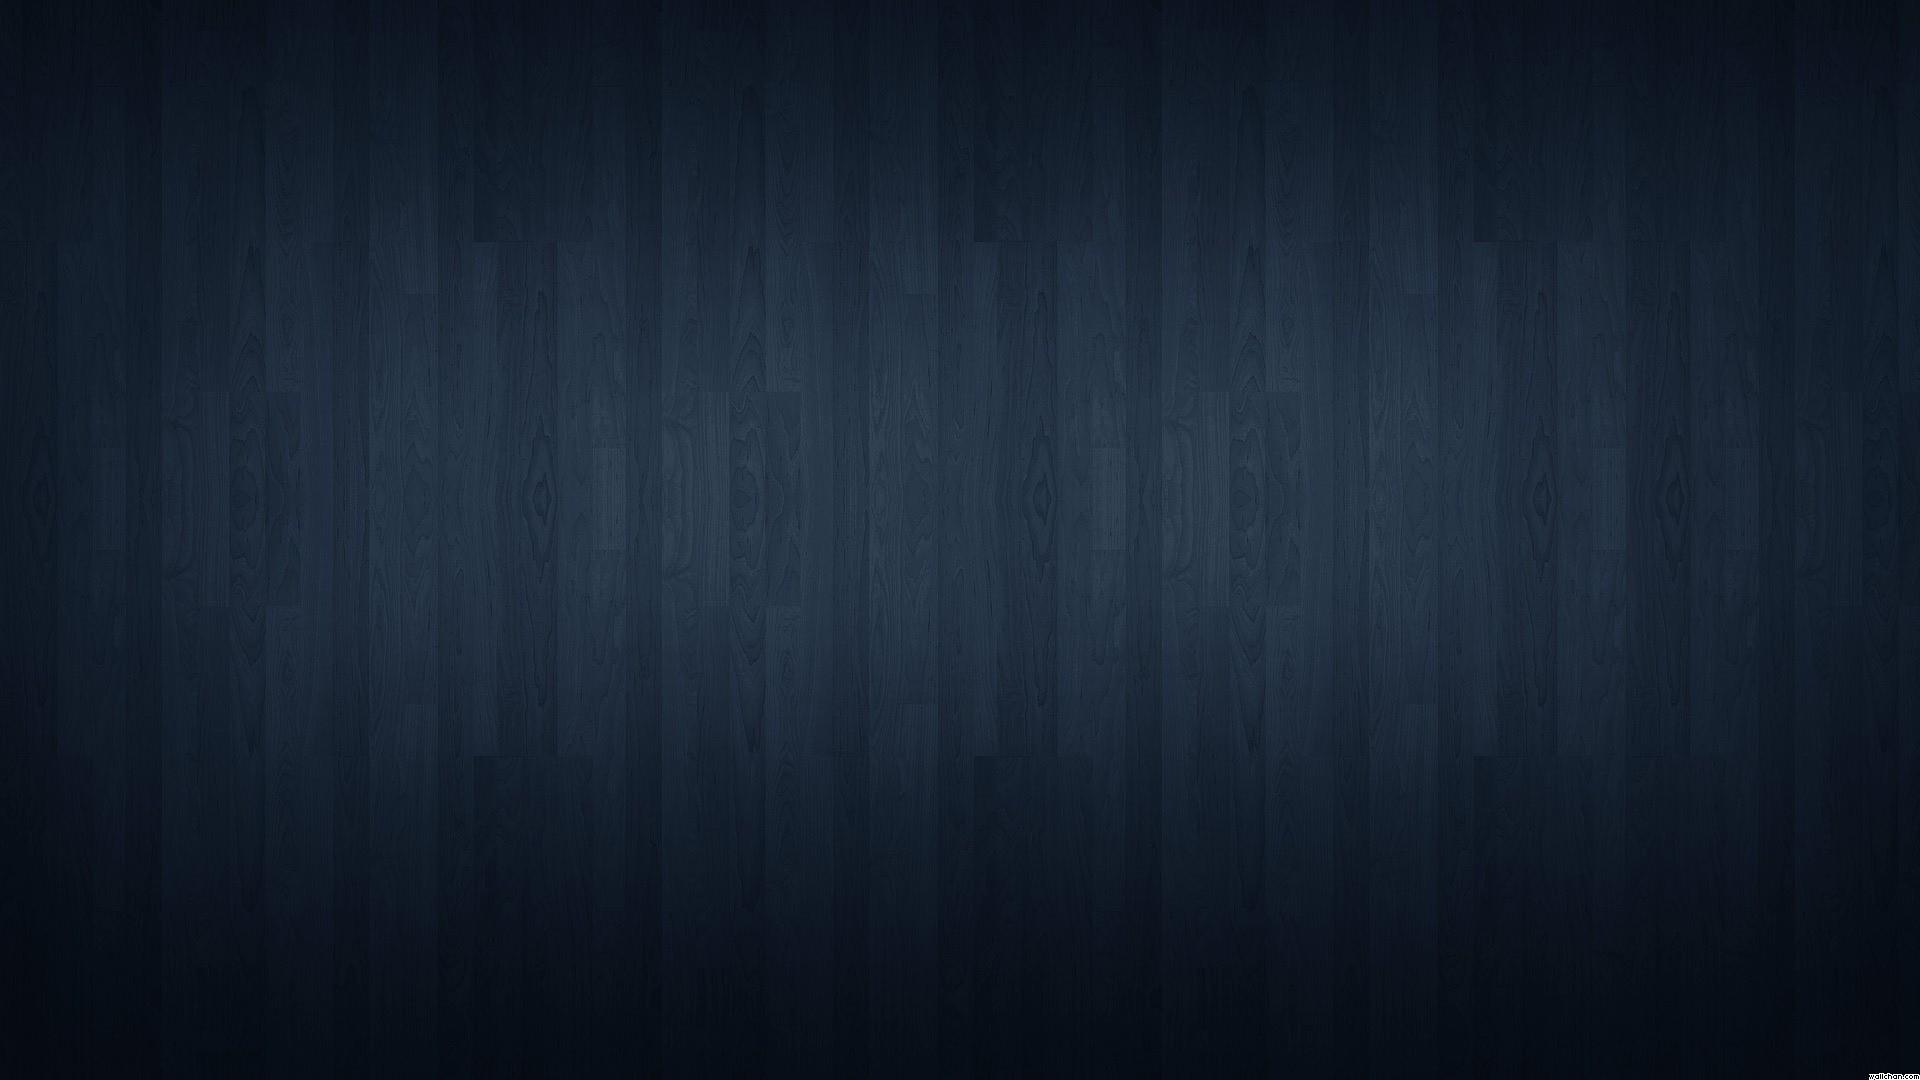 Dark Blue Wood Floor Background Wallpaper